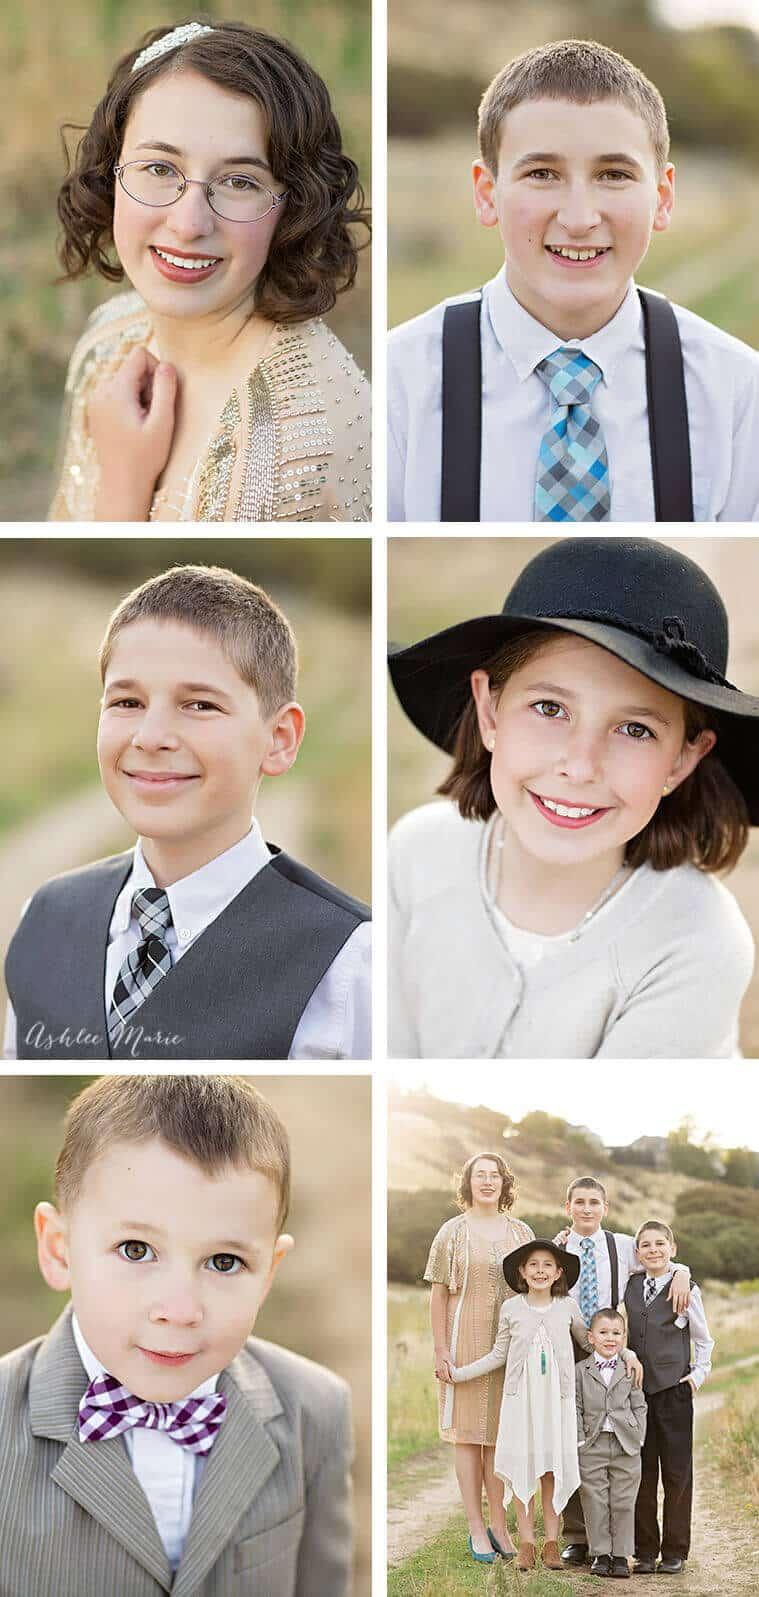 Ashlee Marie Kids